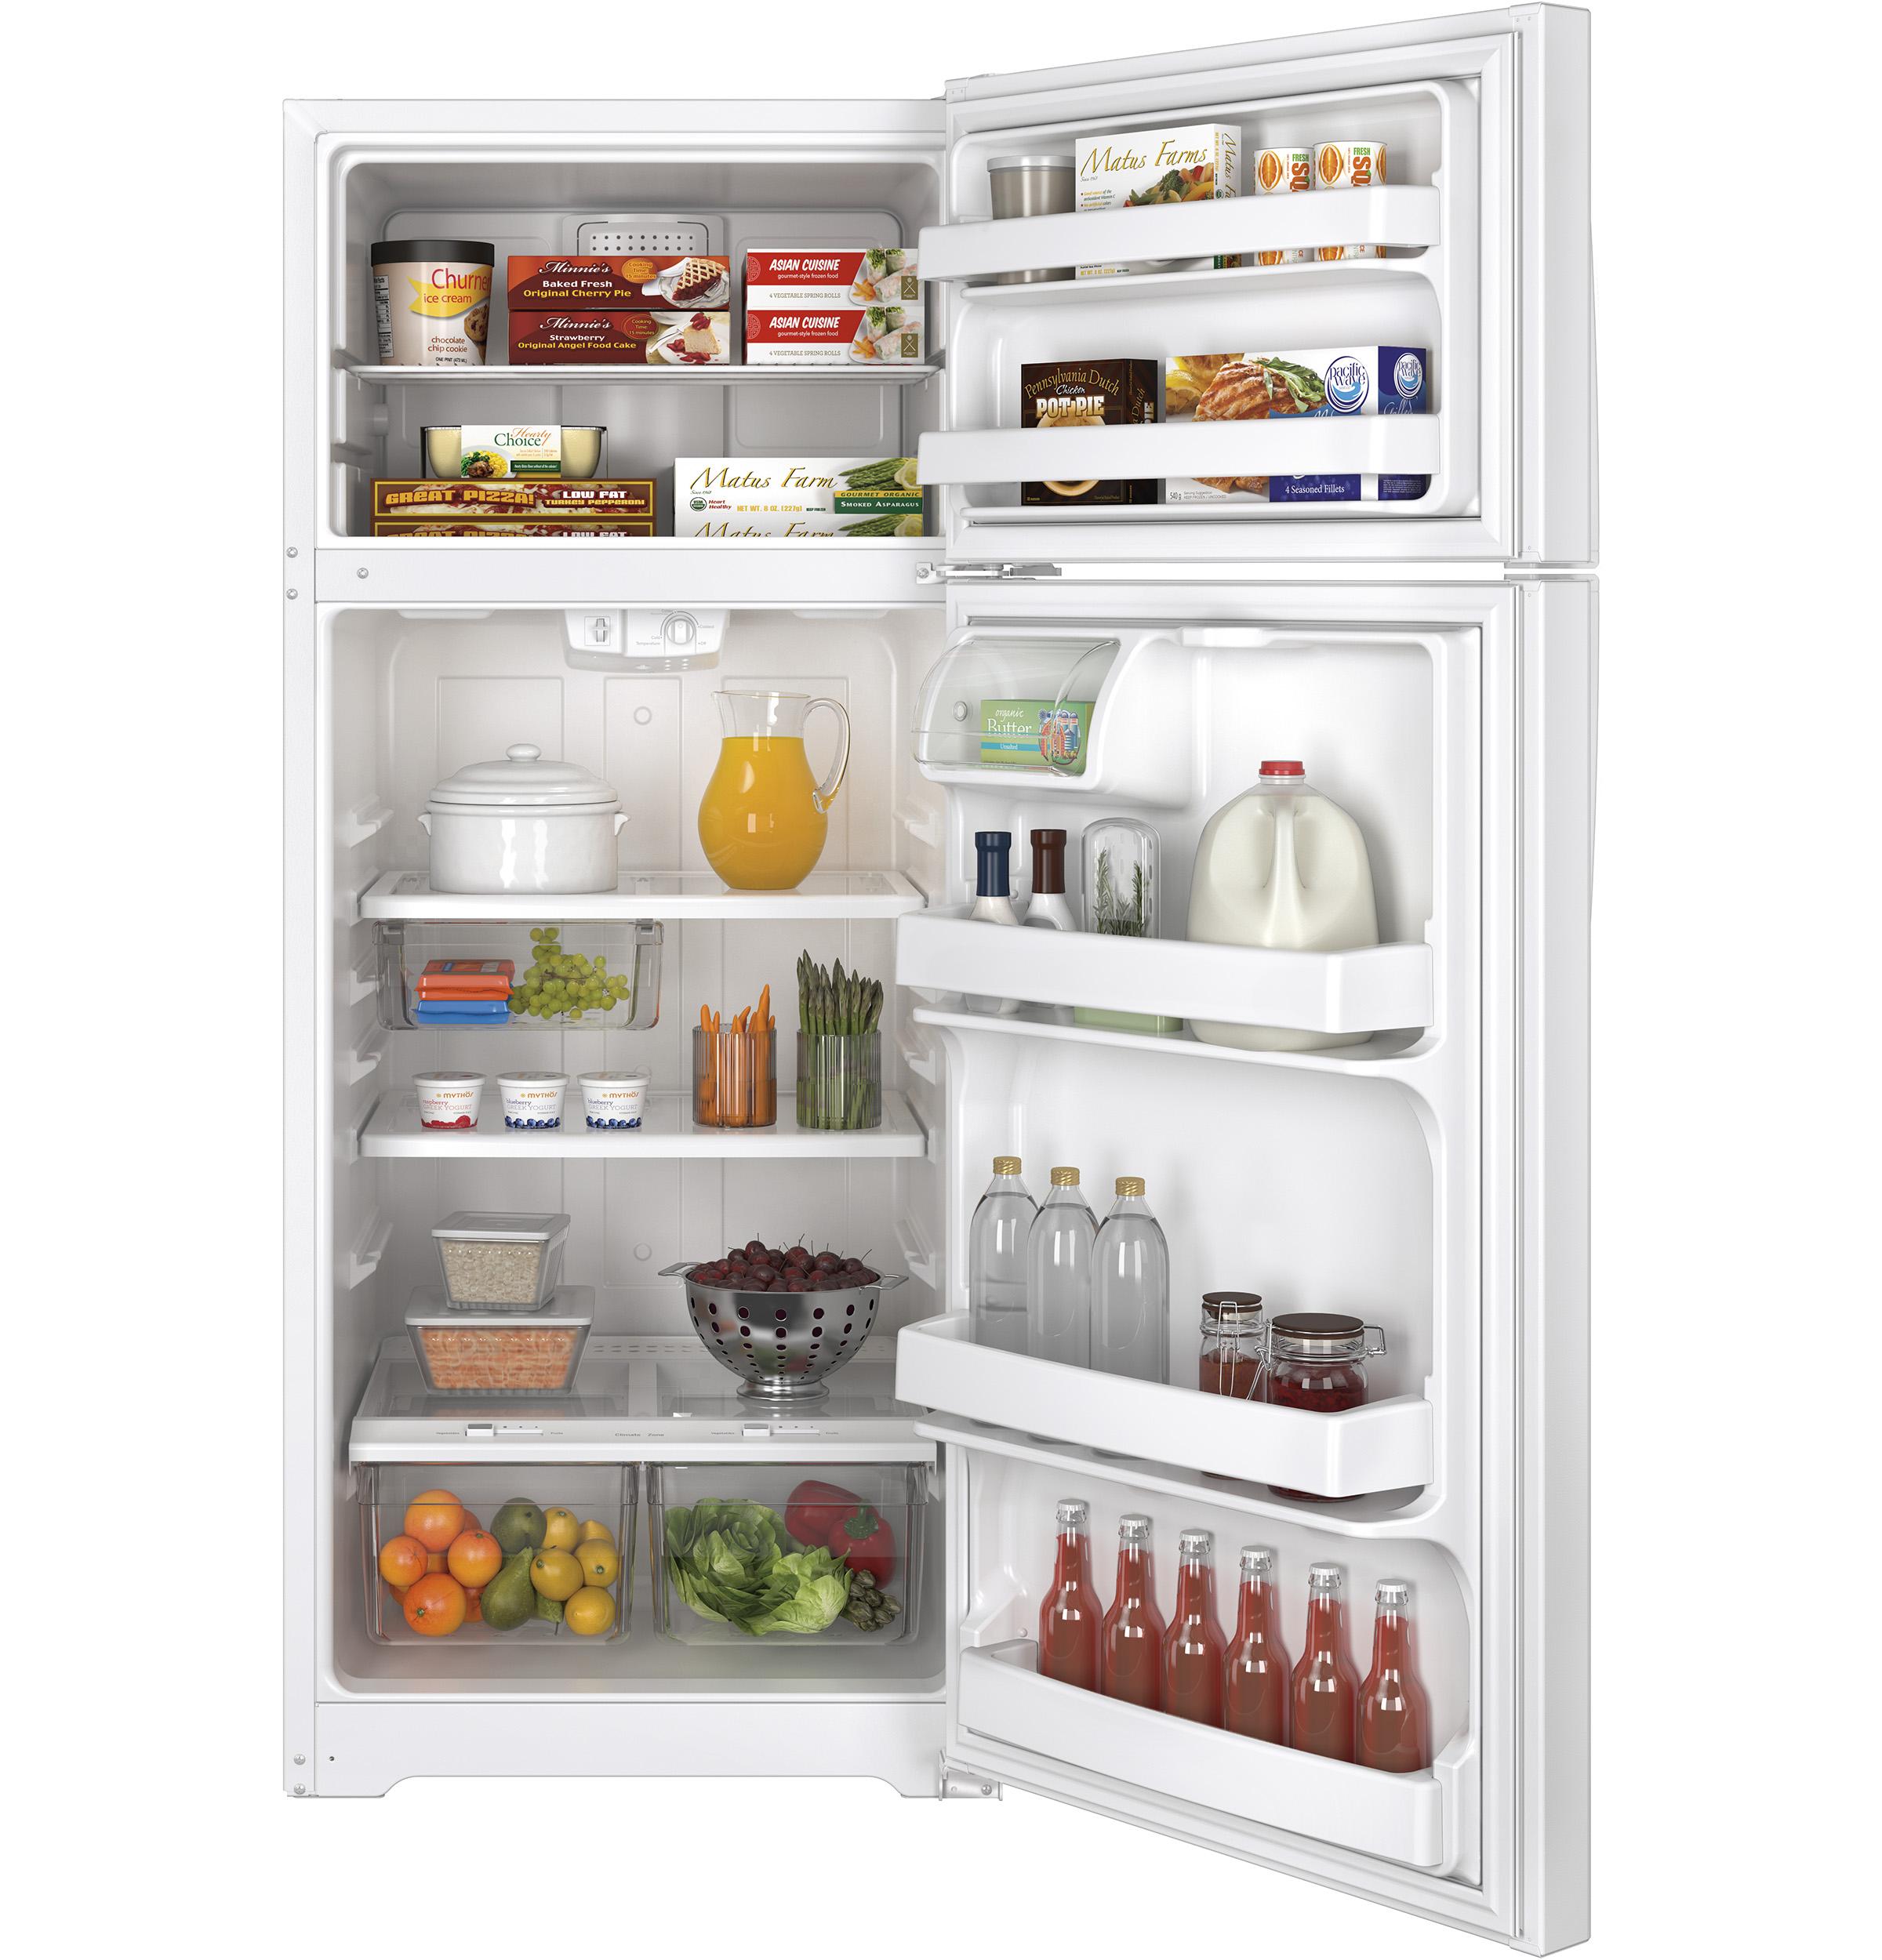 Model: GTE18GTHWW   GE GE® ENERGY STAR® 17.5 Cu. Ft. Top-Freezer Refrigerator